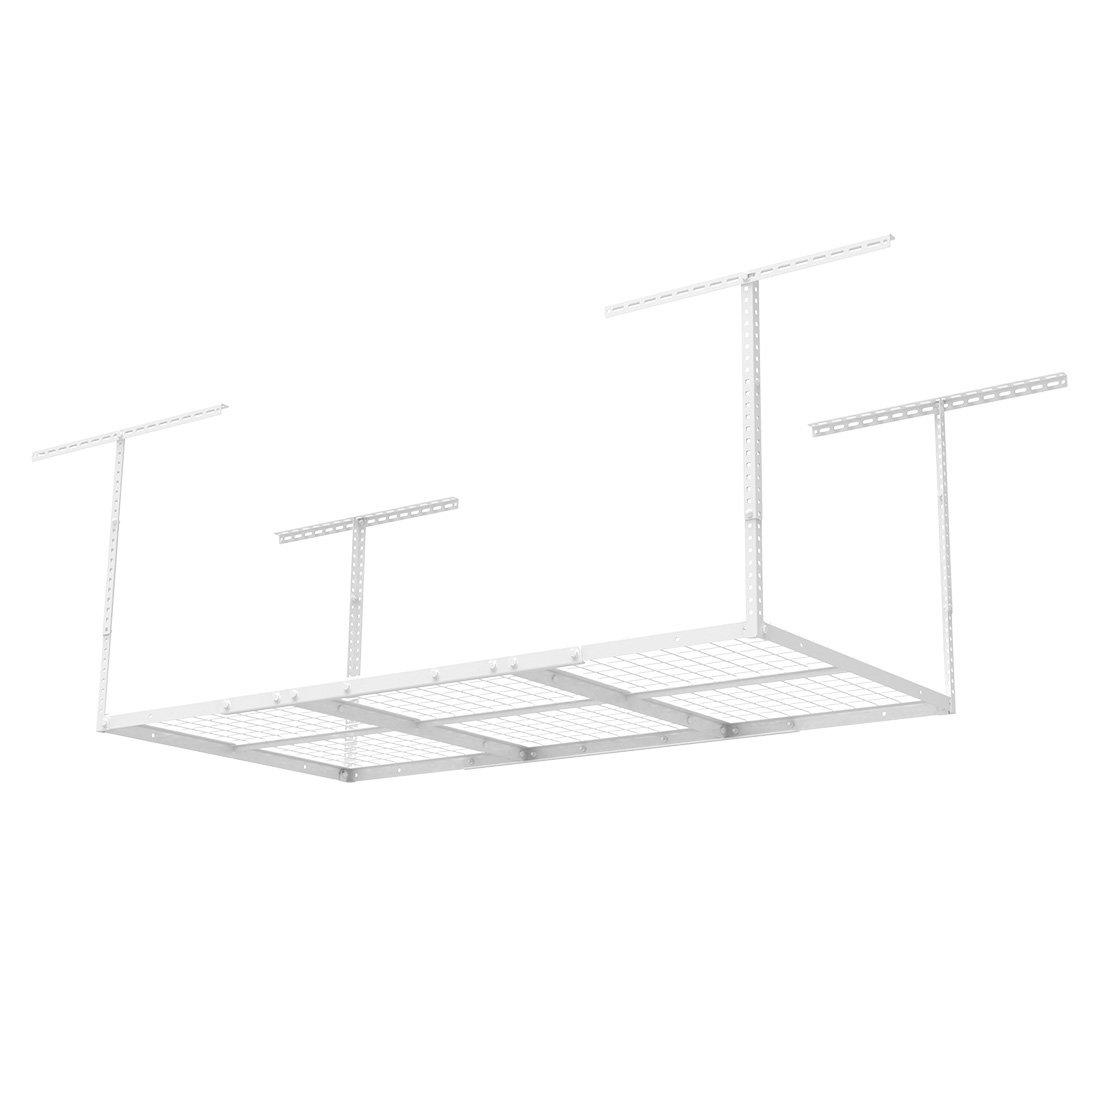 FLEXIMOUNTS (2 pcs) 3x6 Heavy Duty Overhead Garage Adjustable Ceiling Storage Rack, 72'' Length x 36'' Width x 40'' Height (2-rack-package white)